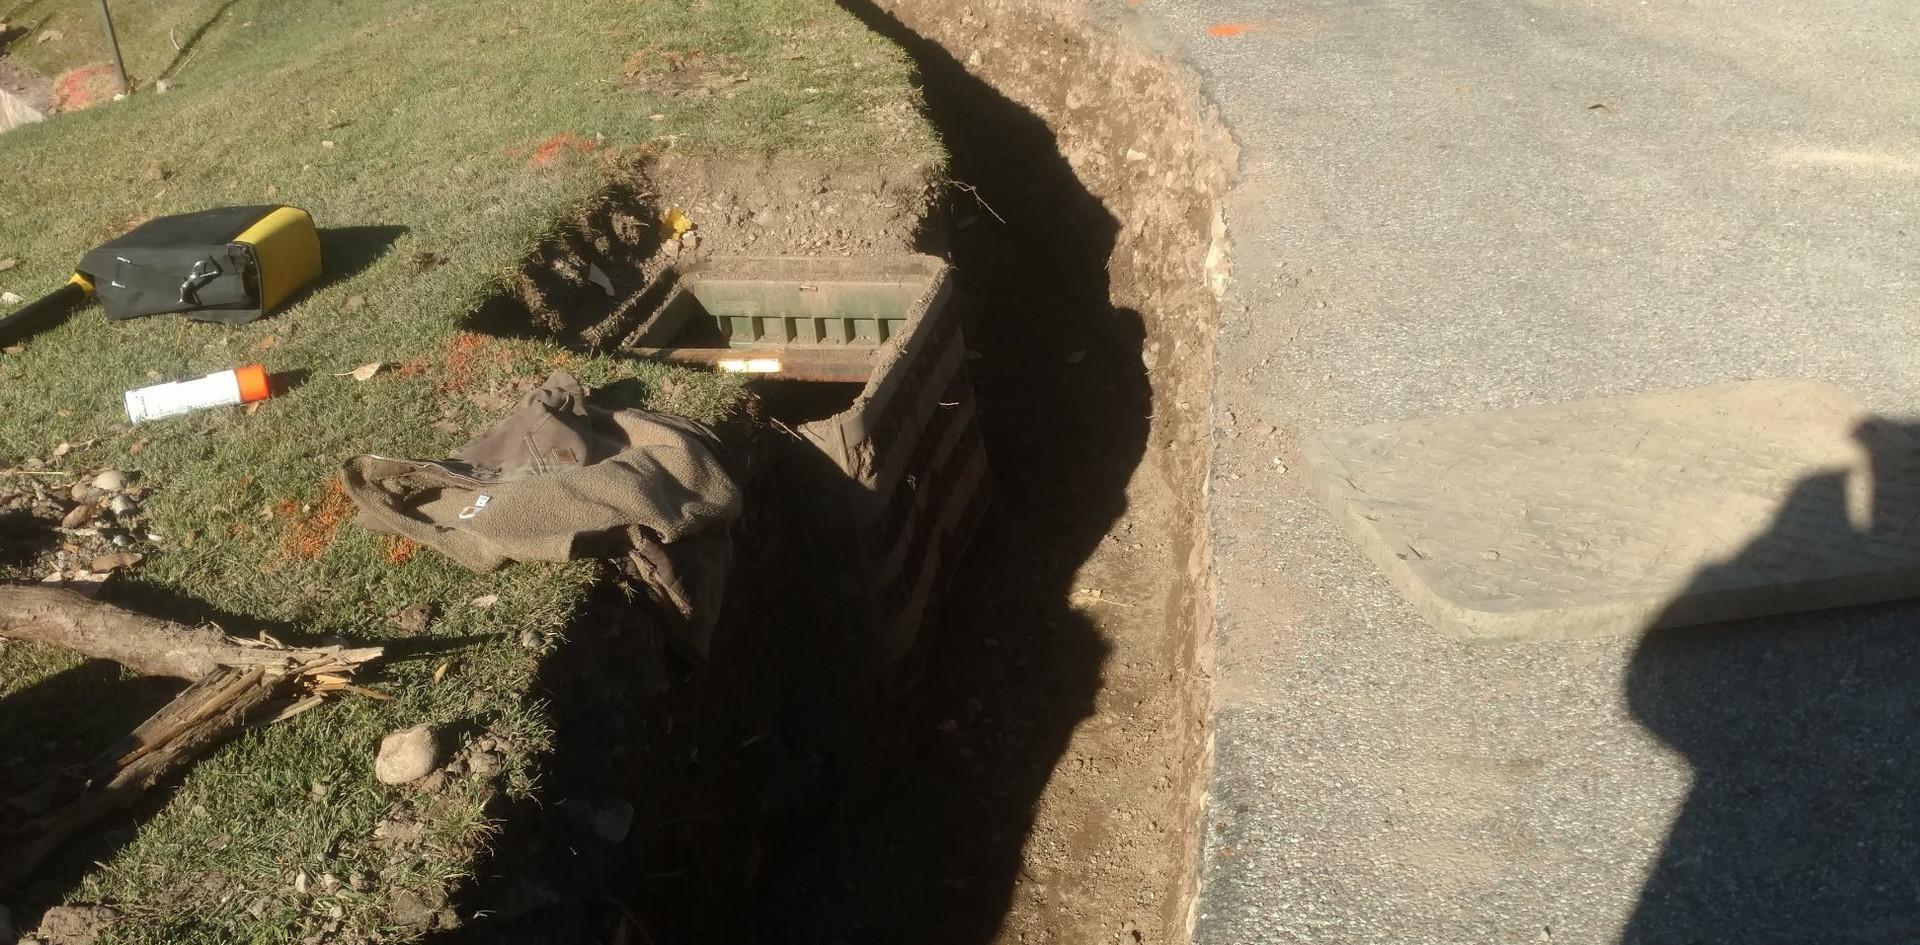 Trenching job at ironbridge